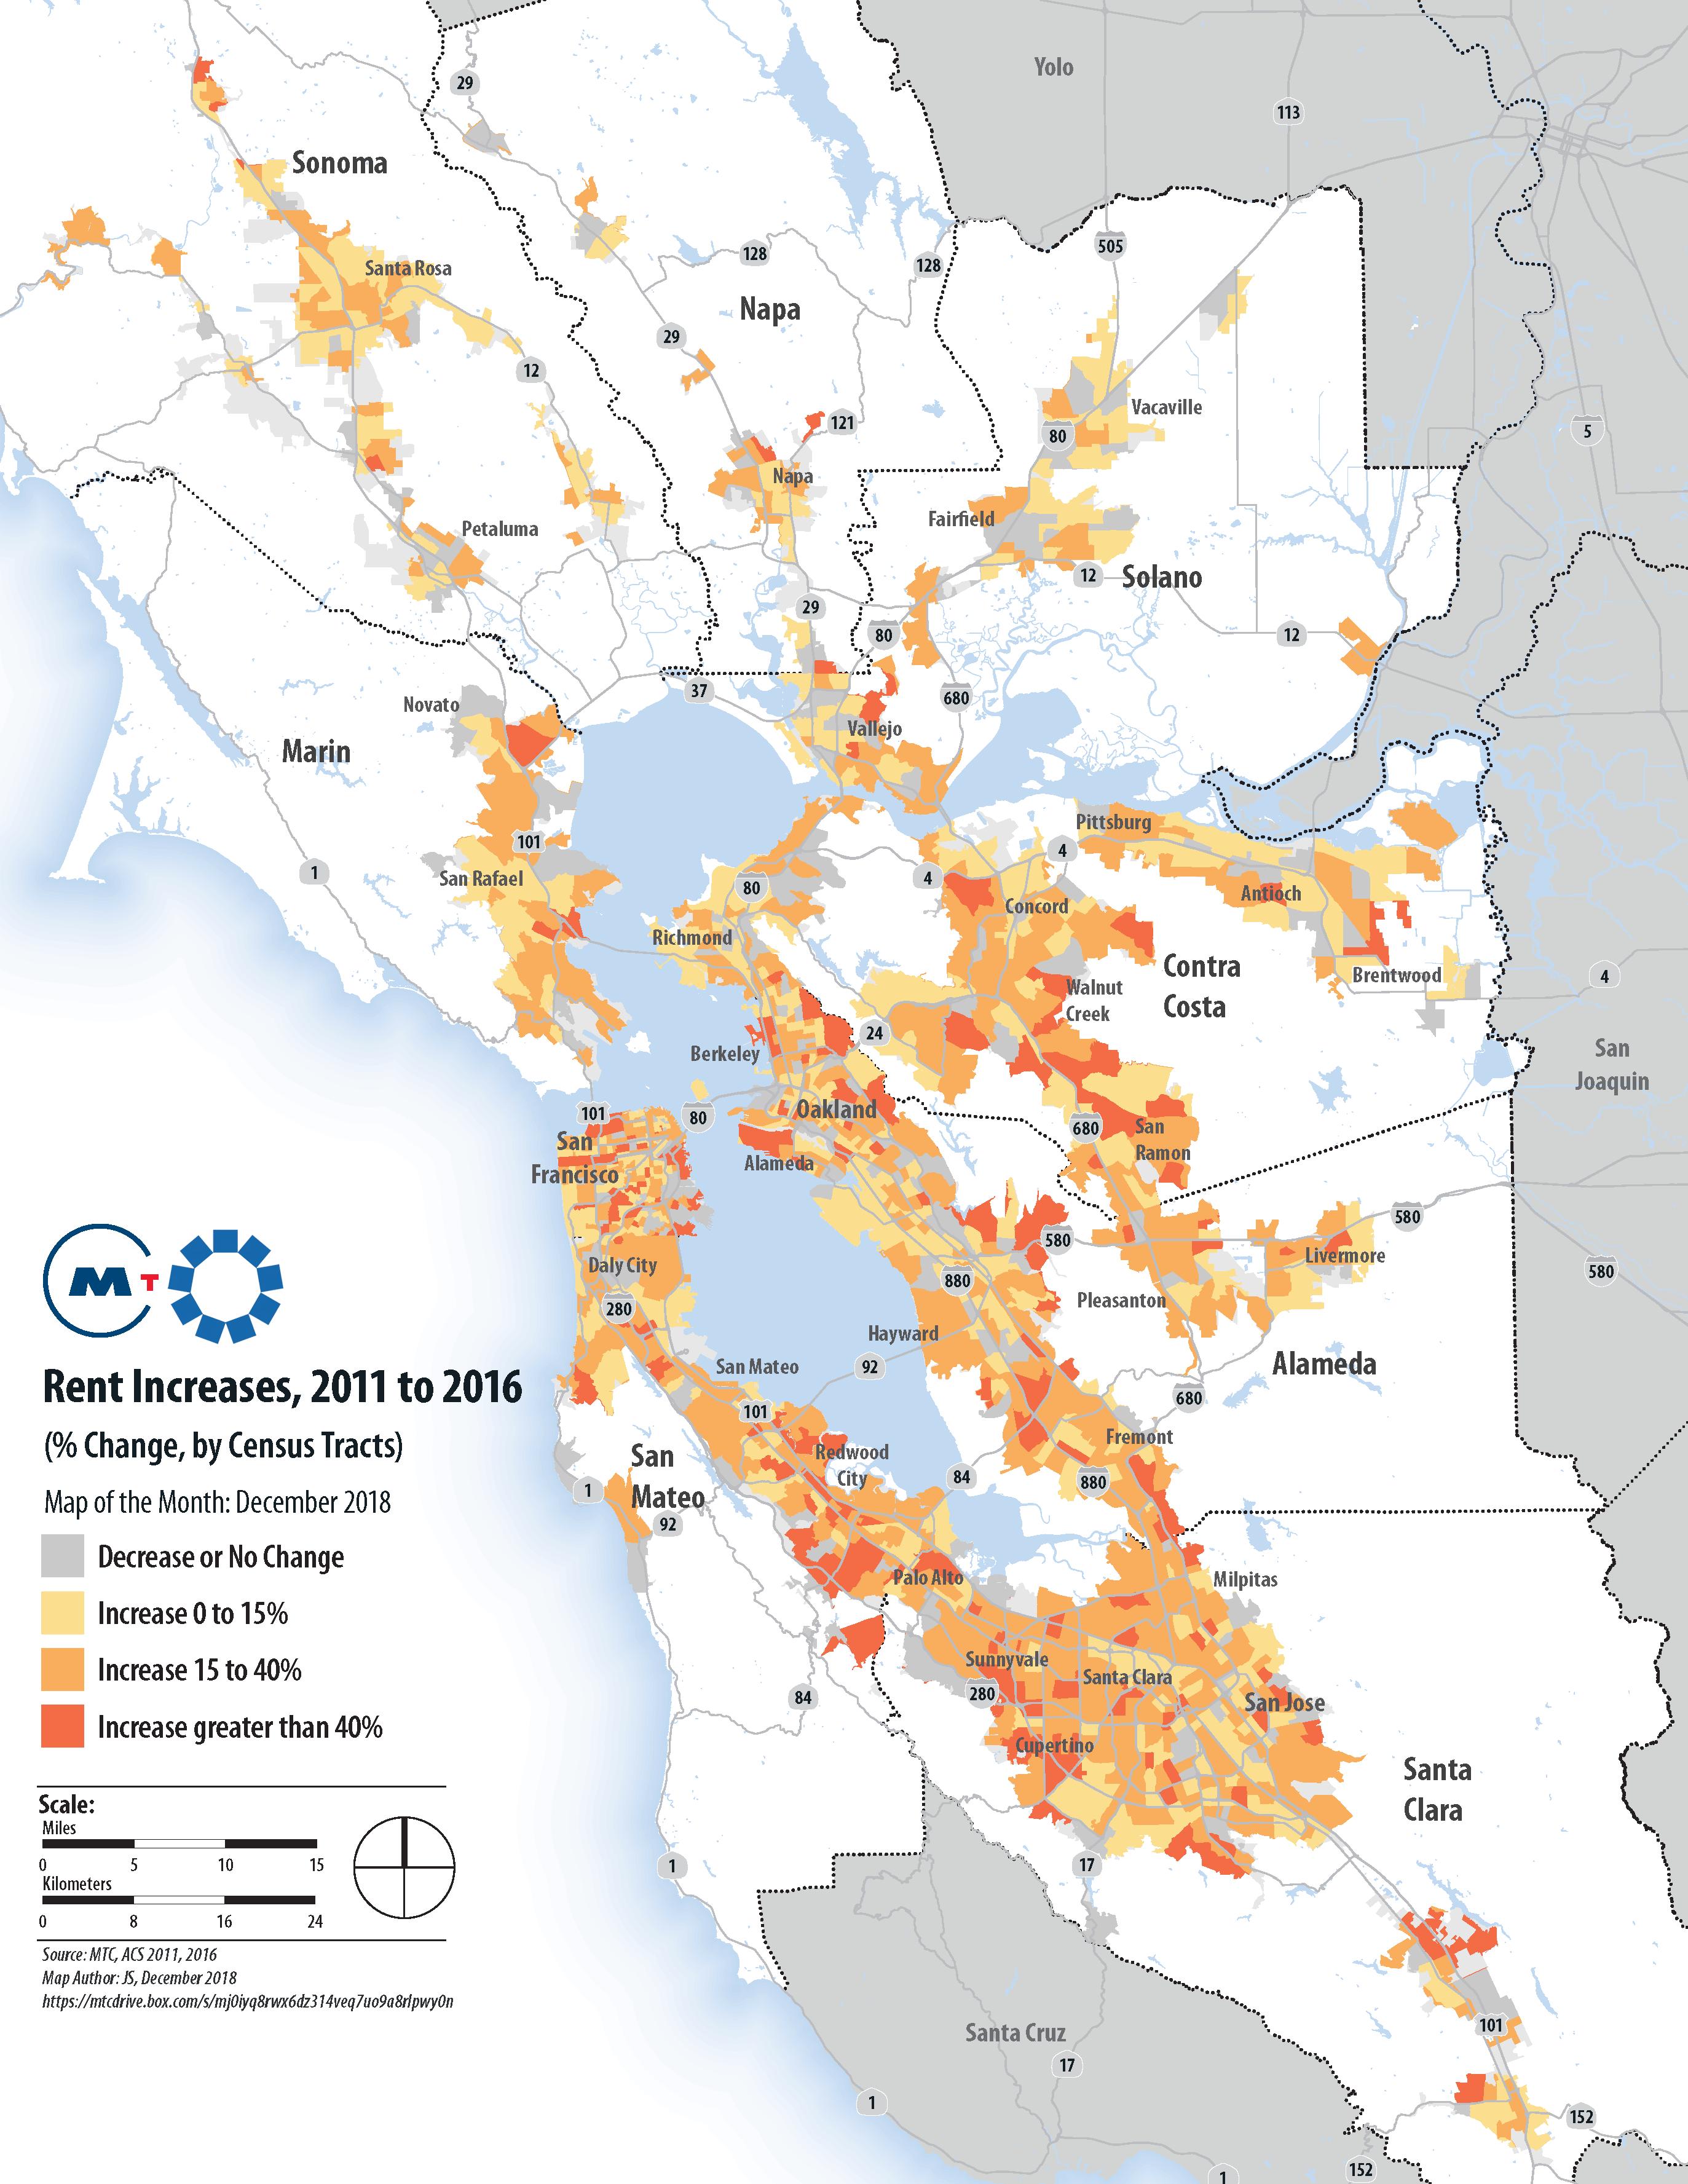 Map of the Month | ociation of Bay Area Governments San Francisco Rent Map on san francisco rent rates, heat map, san francisco neighborhoods to avoid, portola ca map, abu dhabi rent map, austin rent map, san francisco rent chart, san francisco ca,